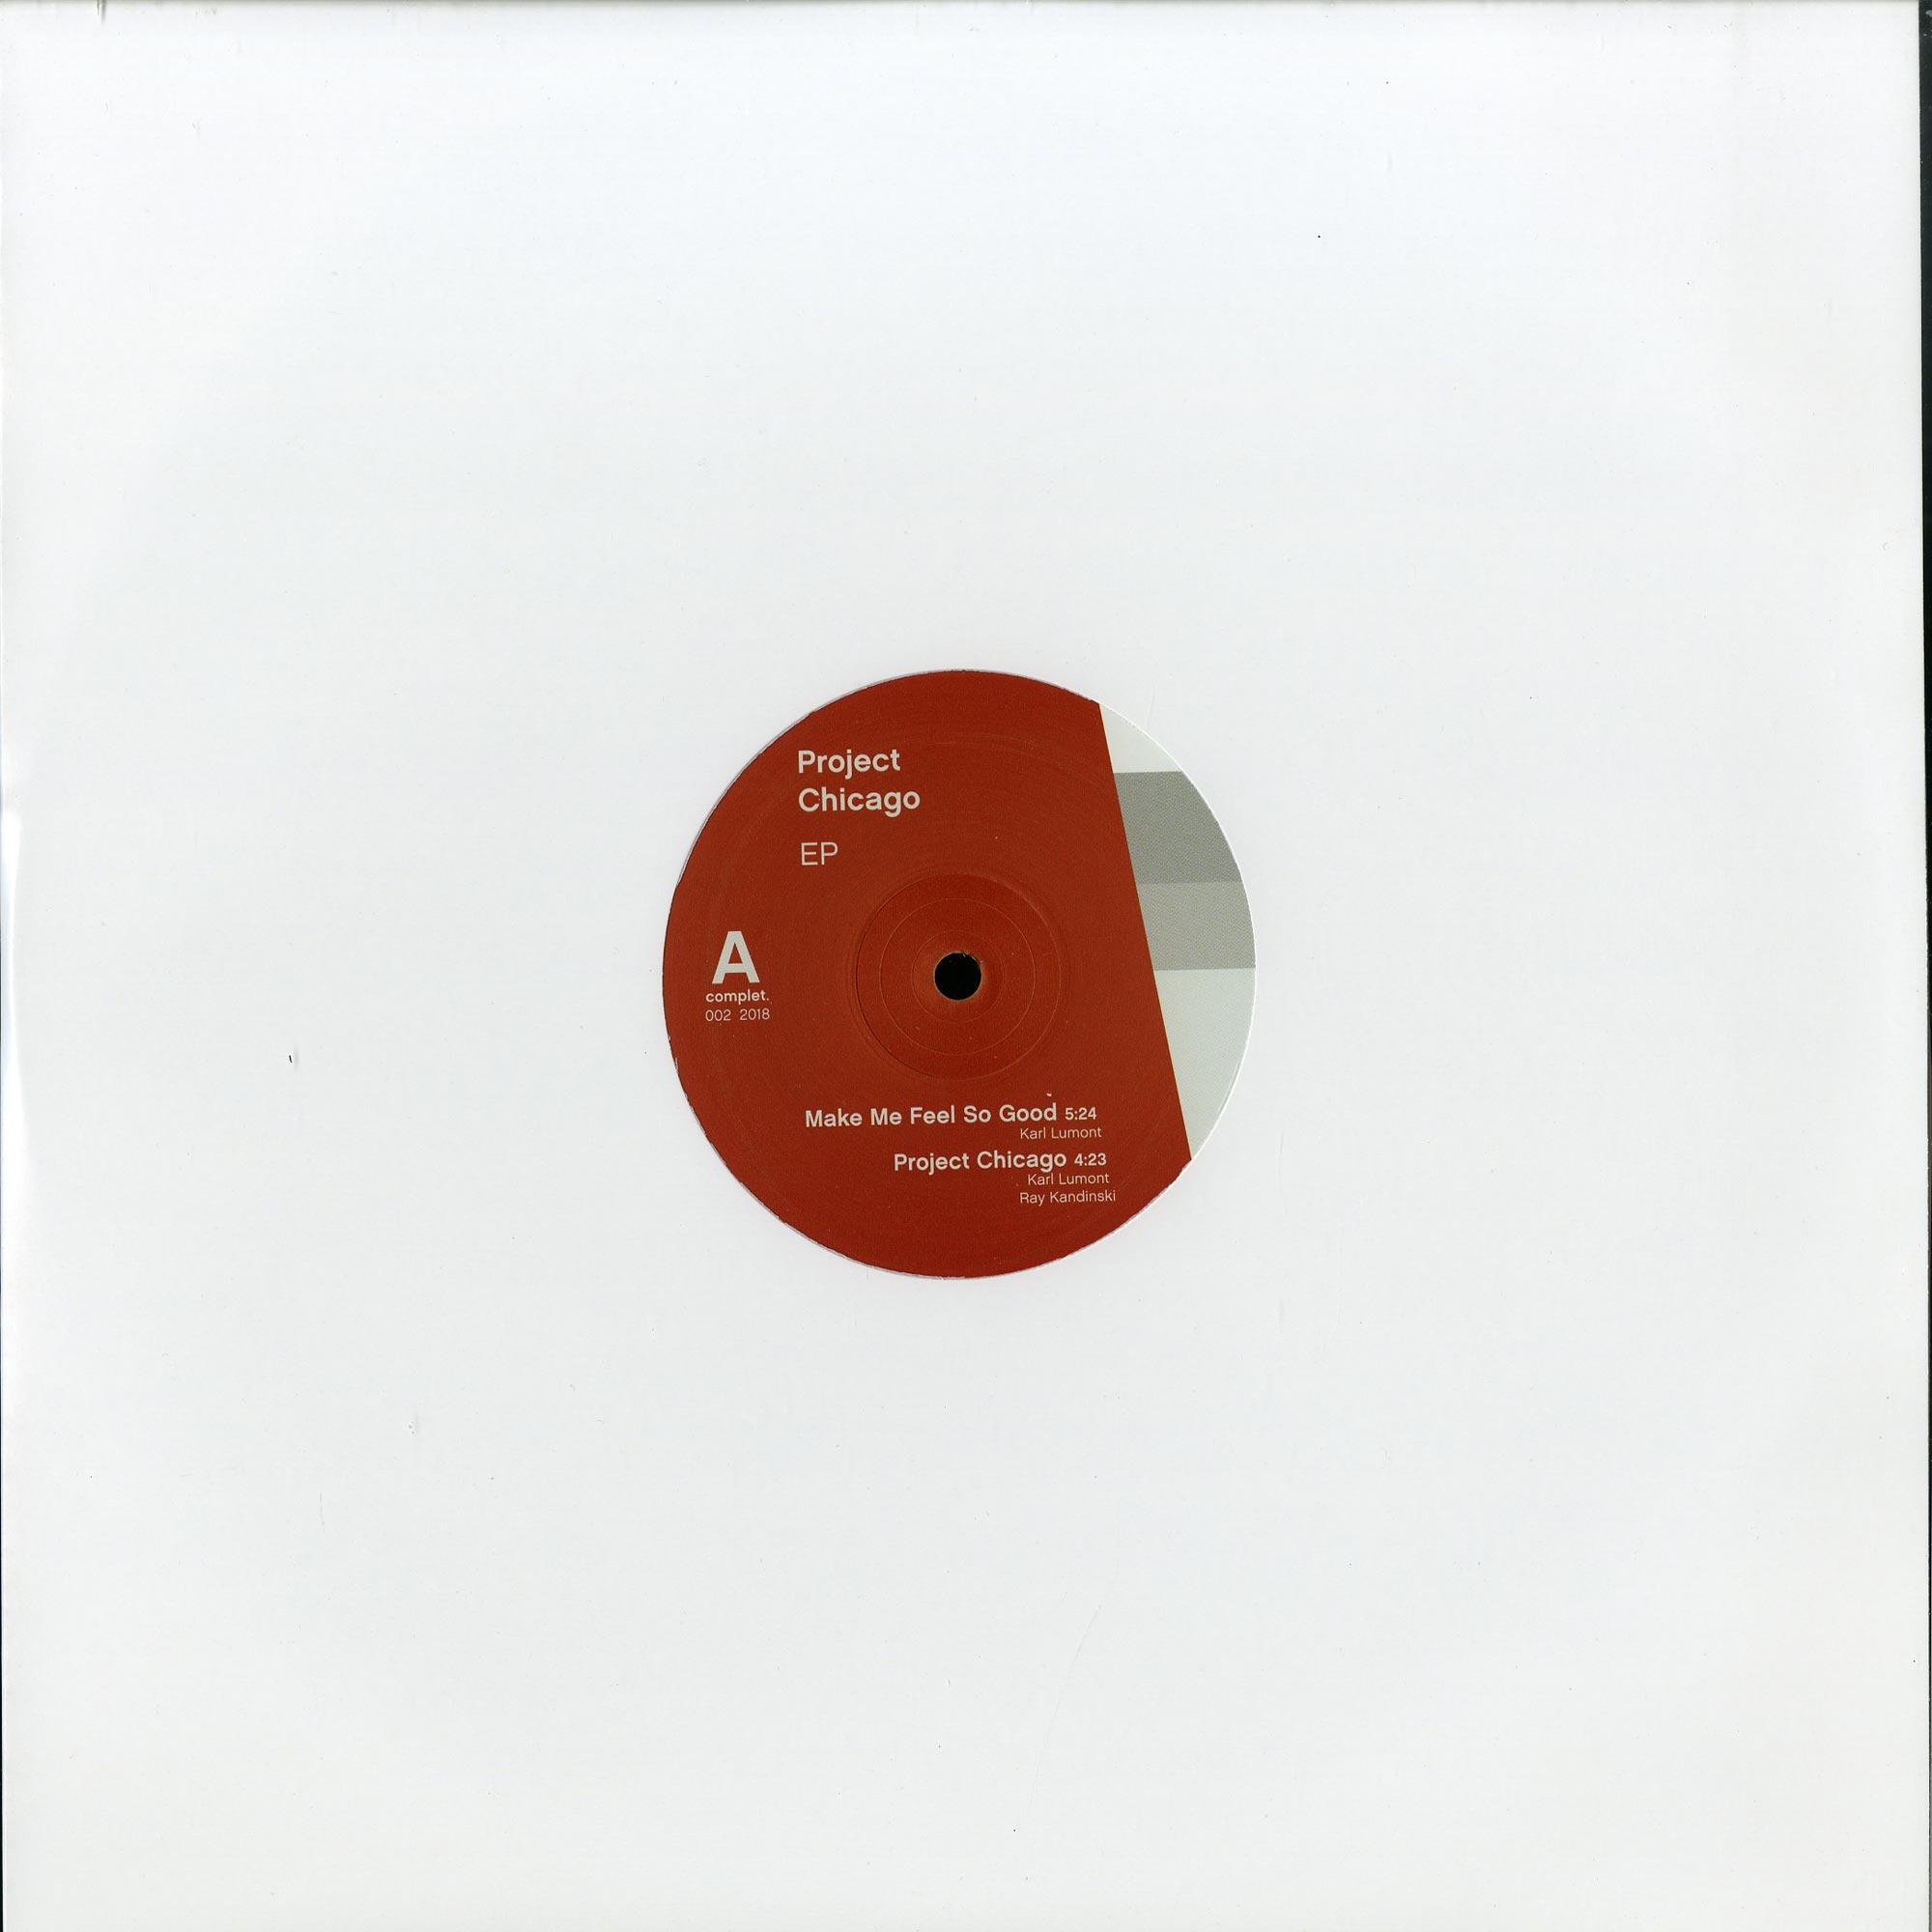 Ray Kandinski & Karl Lumont - PROJECT CHICAGO EP